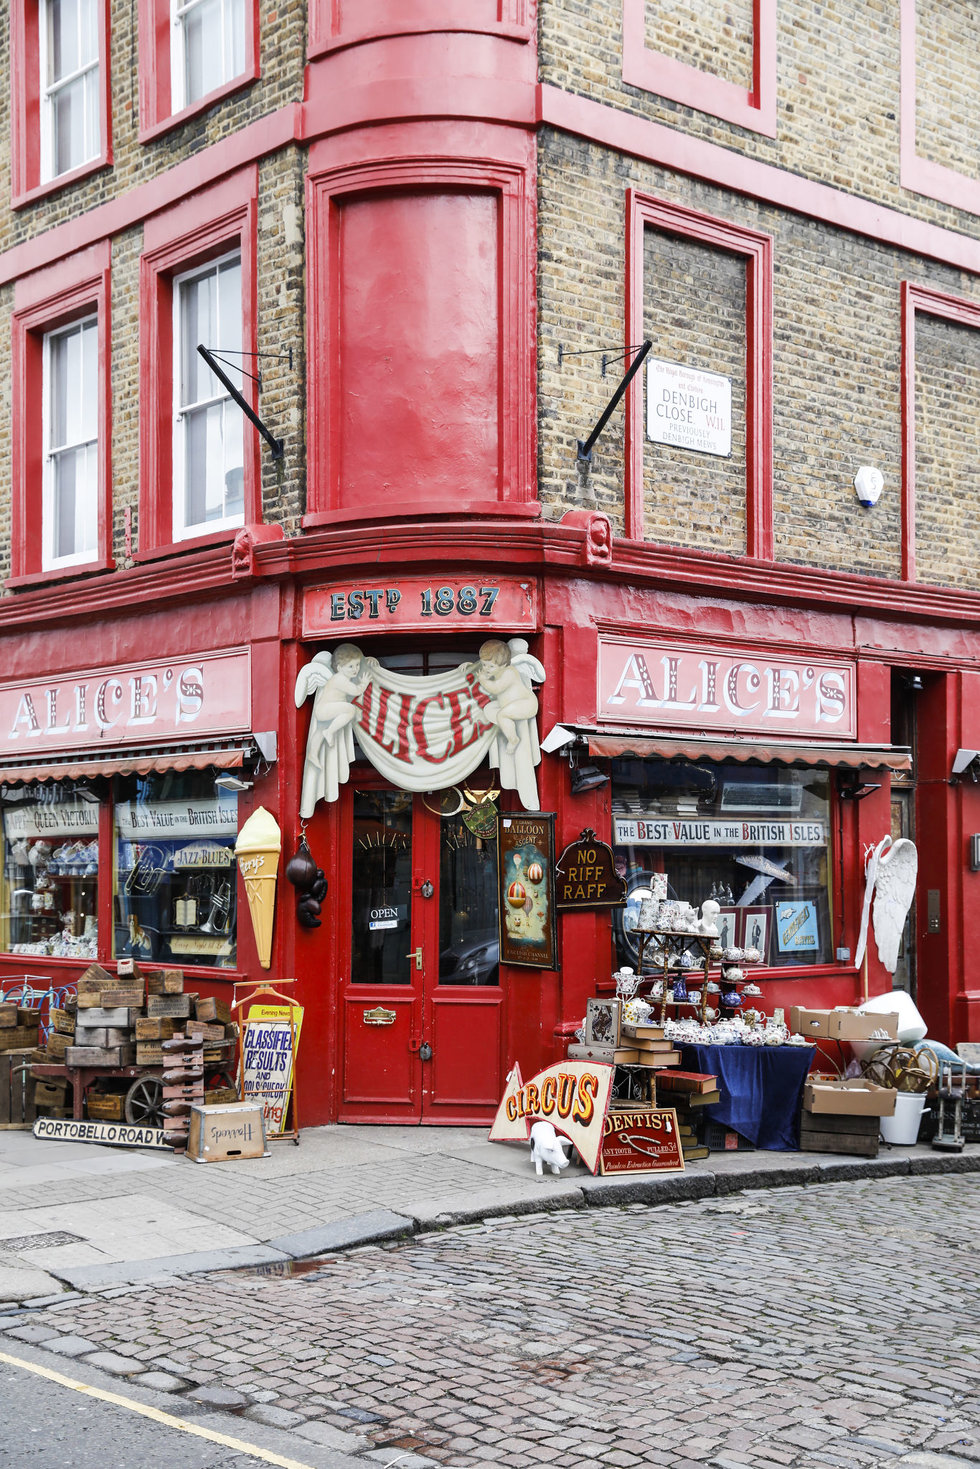 An antiques shop on Portobello Road